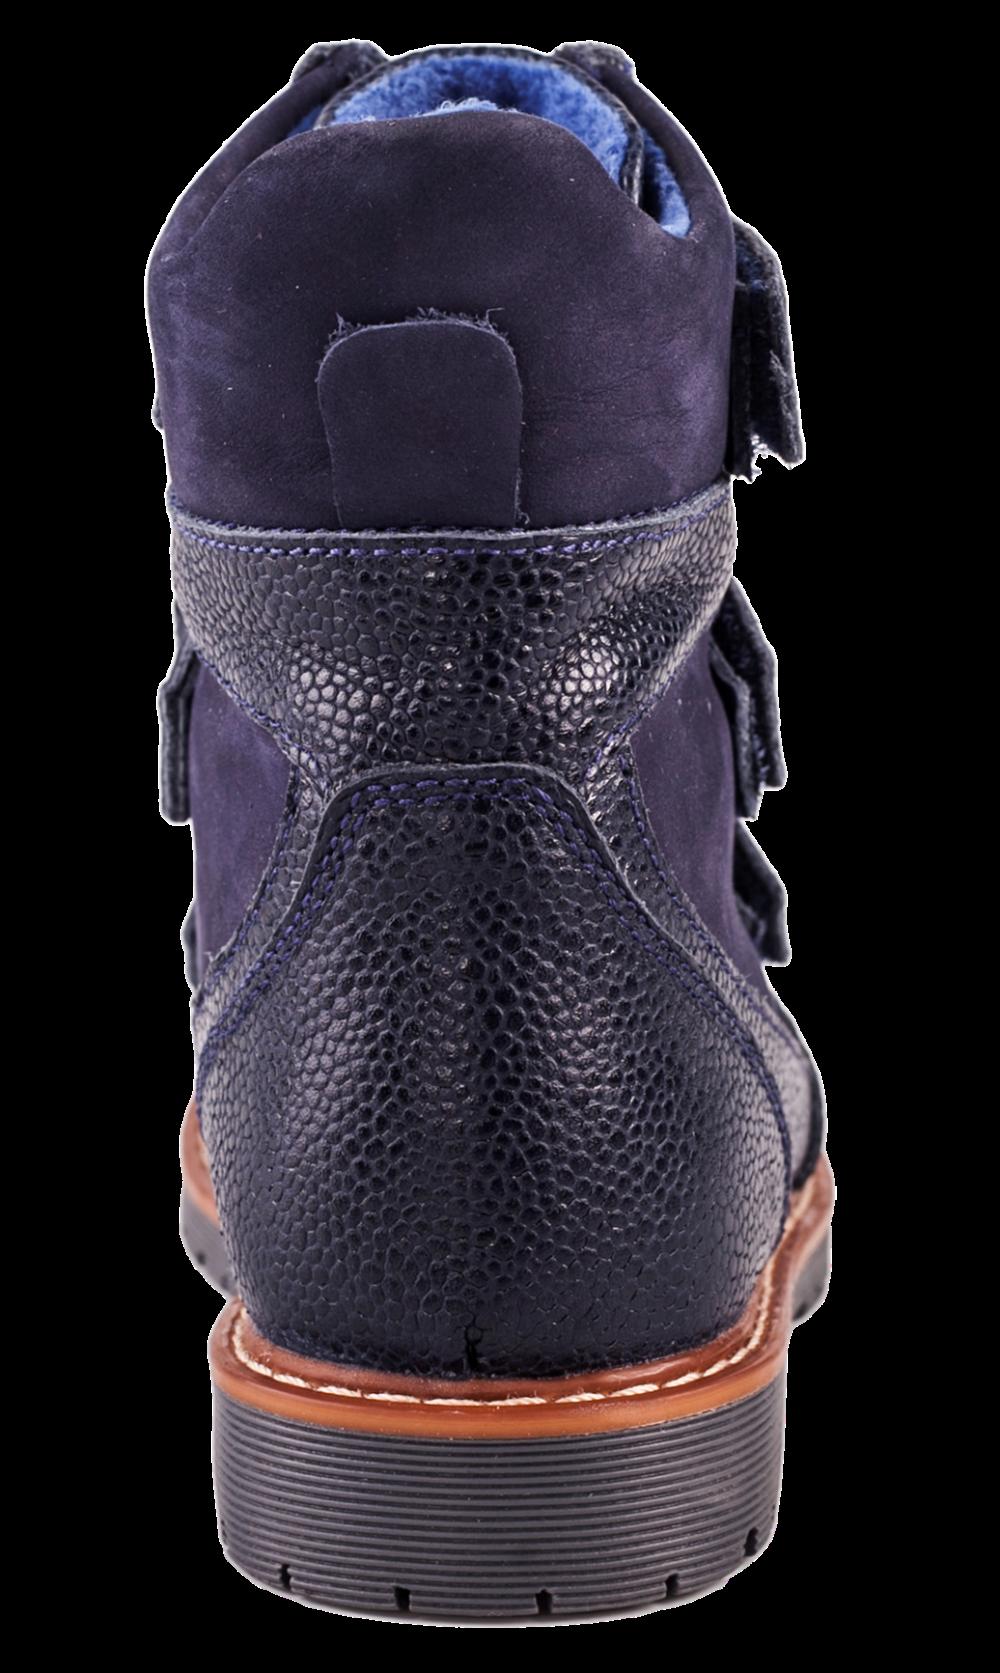 Ботинки ортопедические Форест-Орто 06-548 р. 21-30 - 5